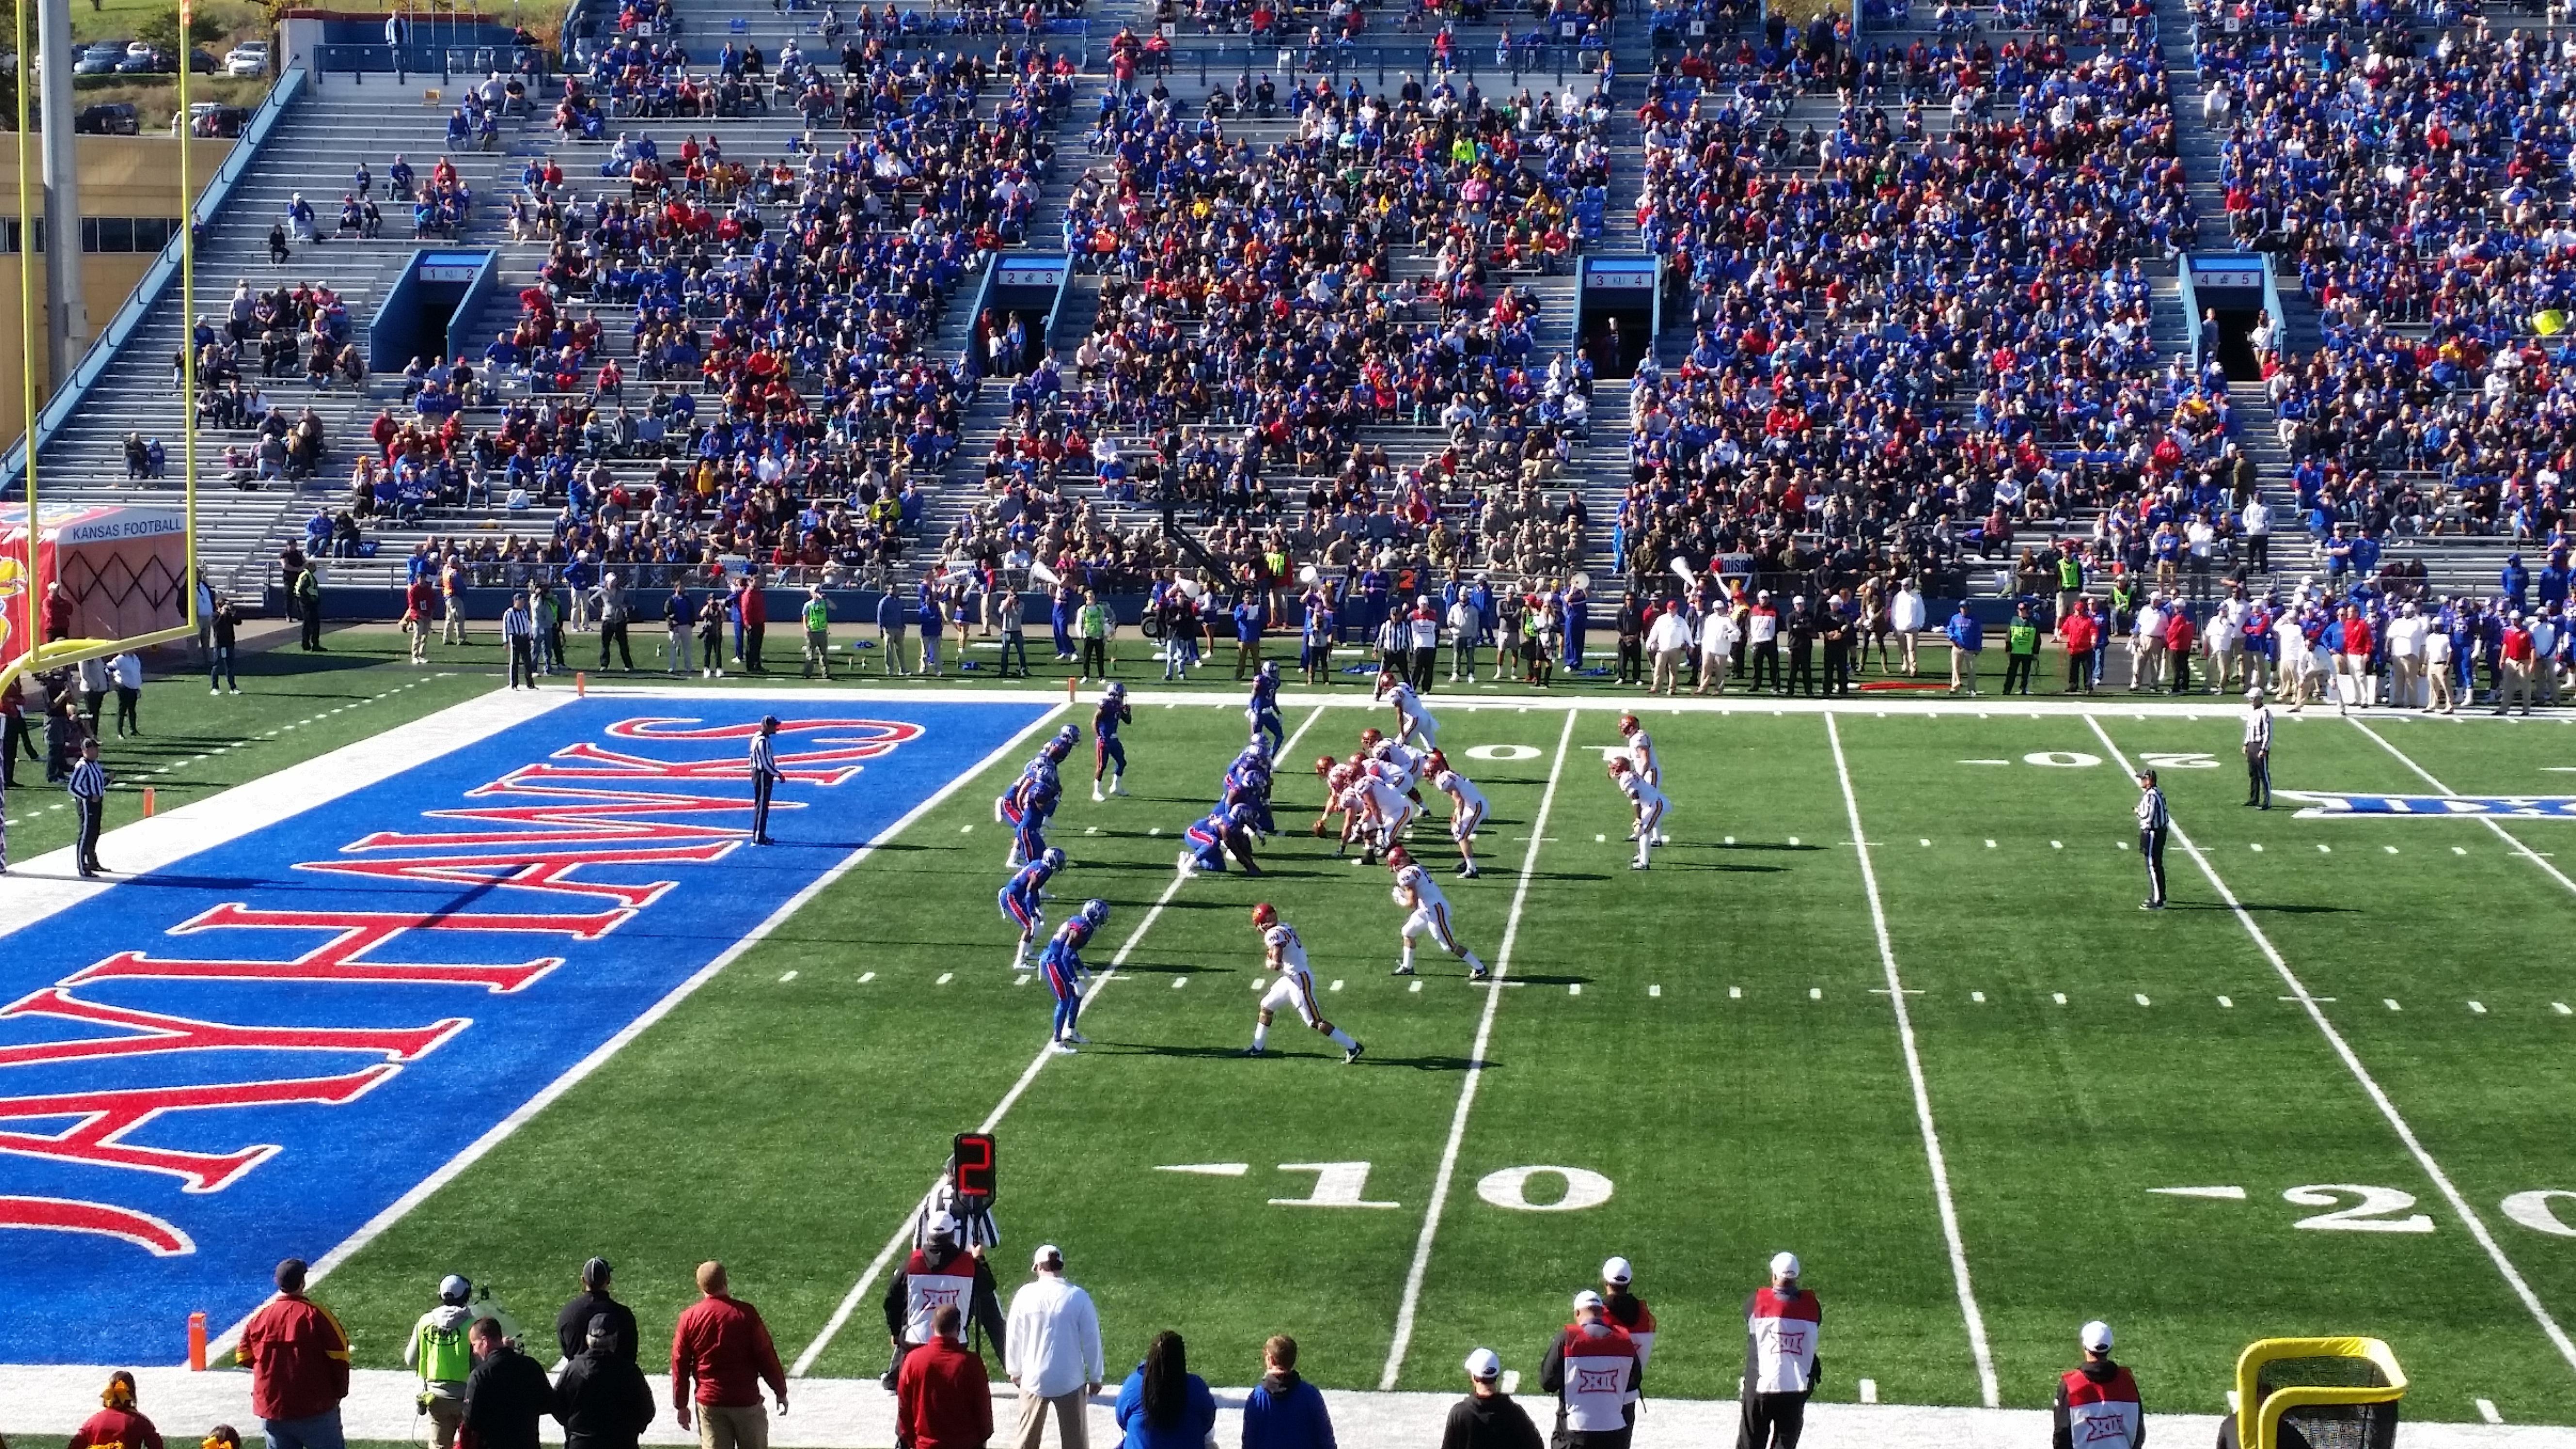 University of Kansas Memorial Stadium Section 23 Row 28 Seat 28